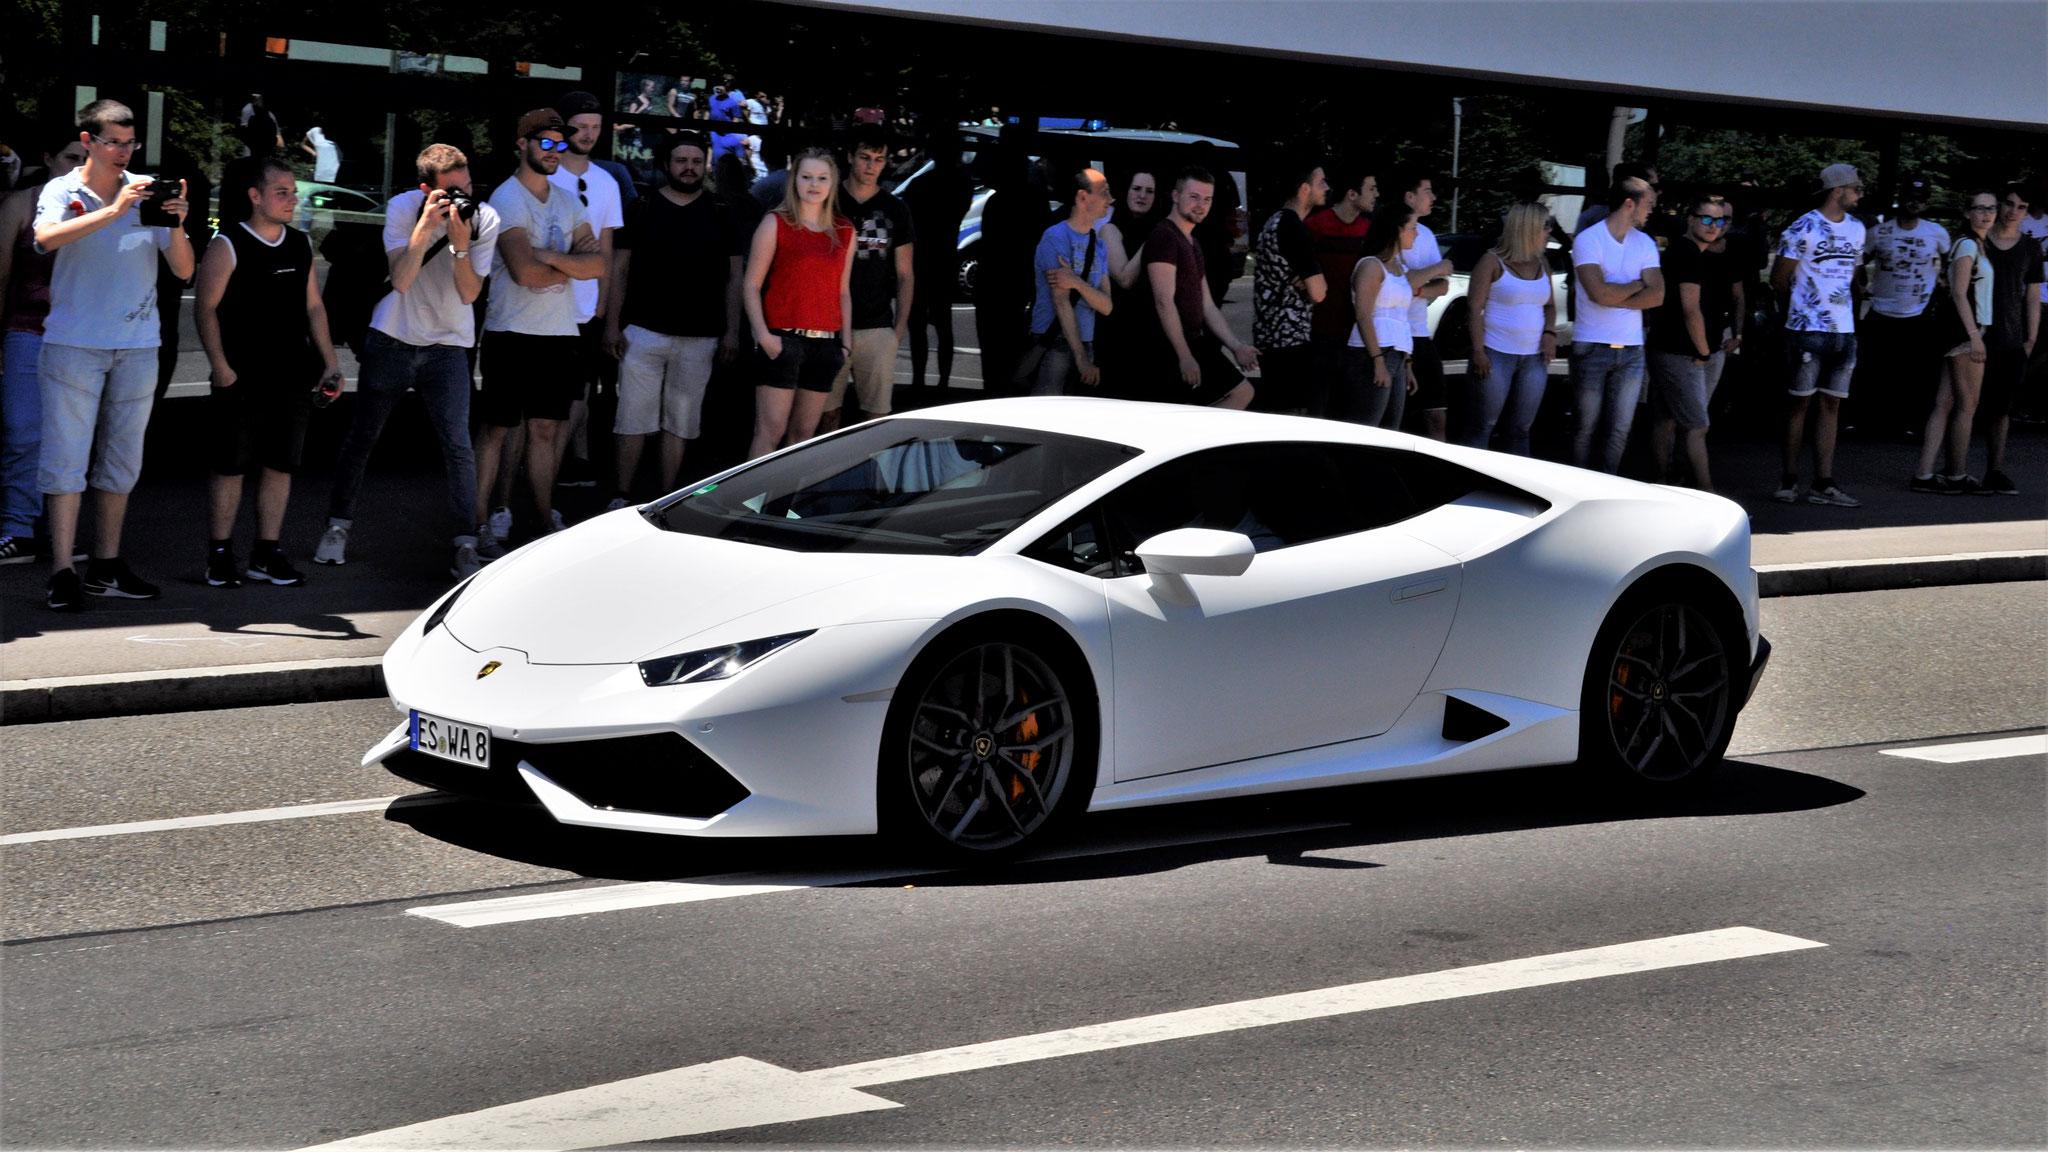 Lamborghini Huracan - ES-WA-8